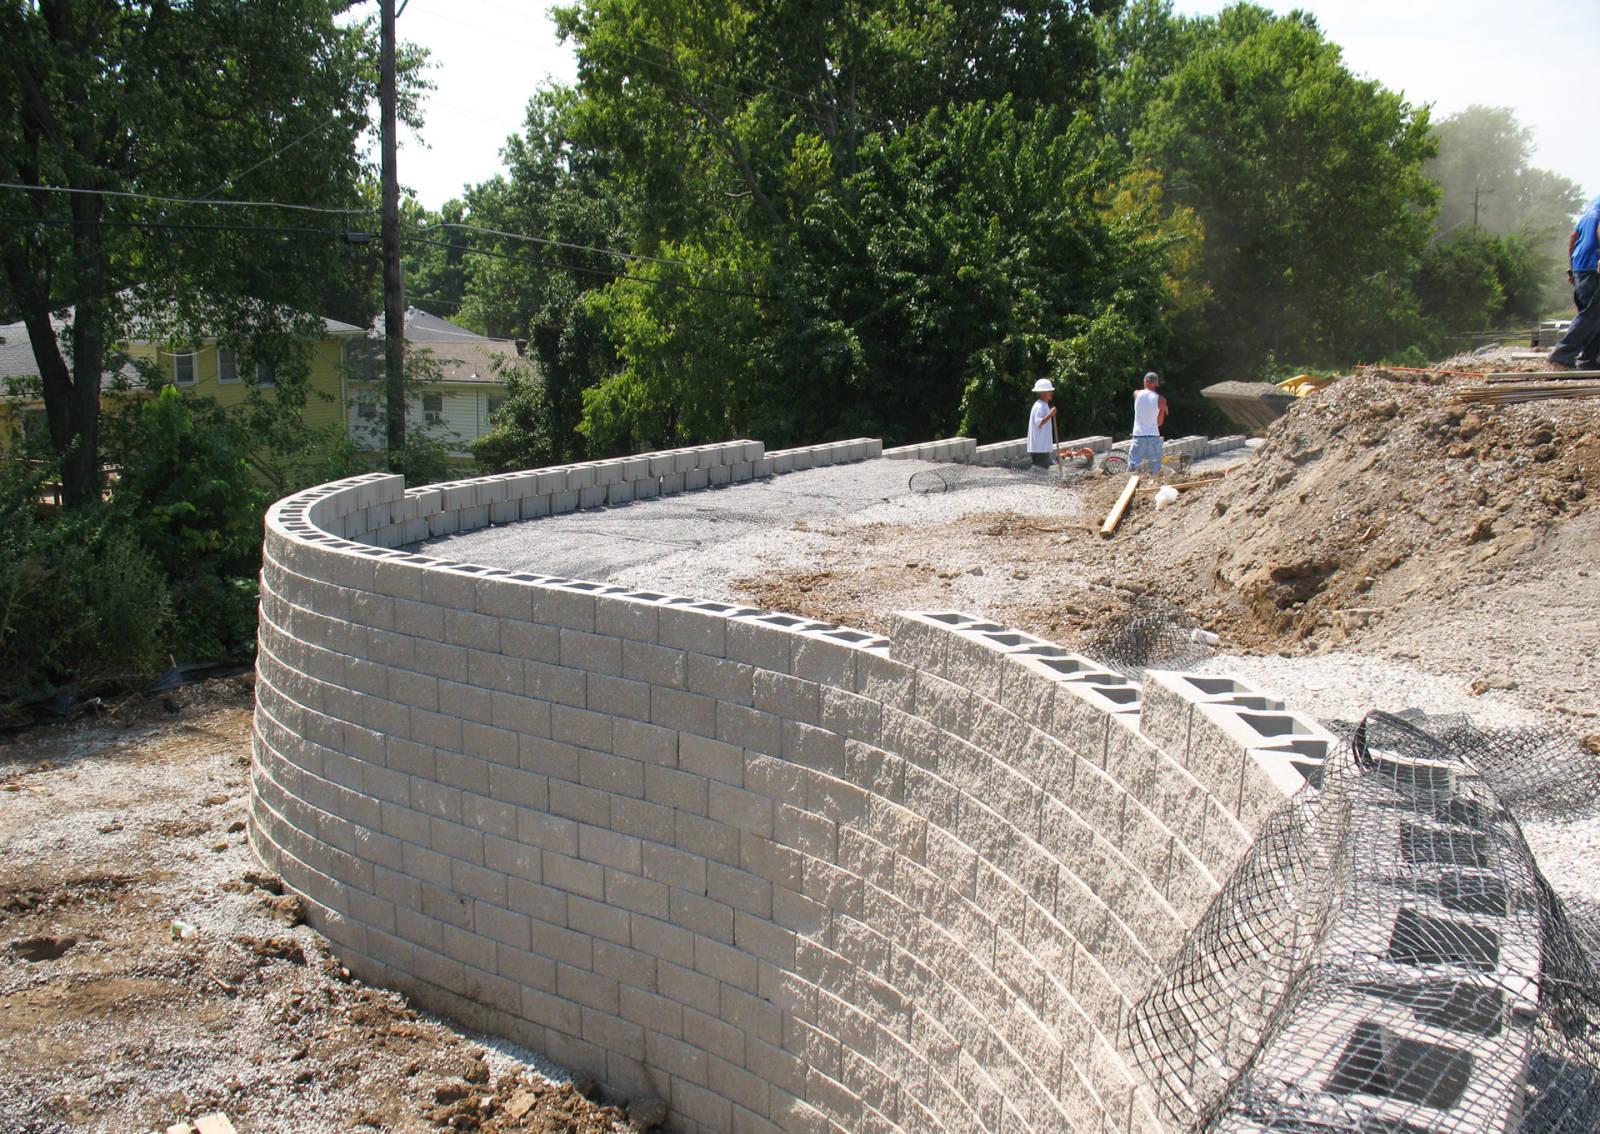 CornerStone retaining wall installation with geogrid